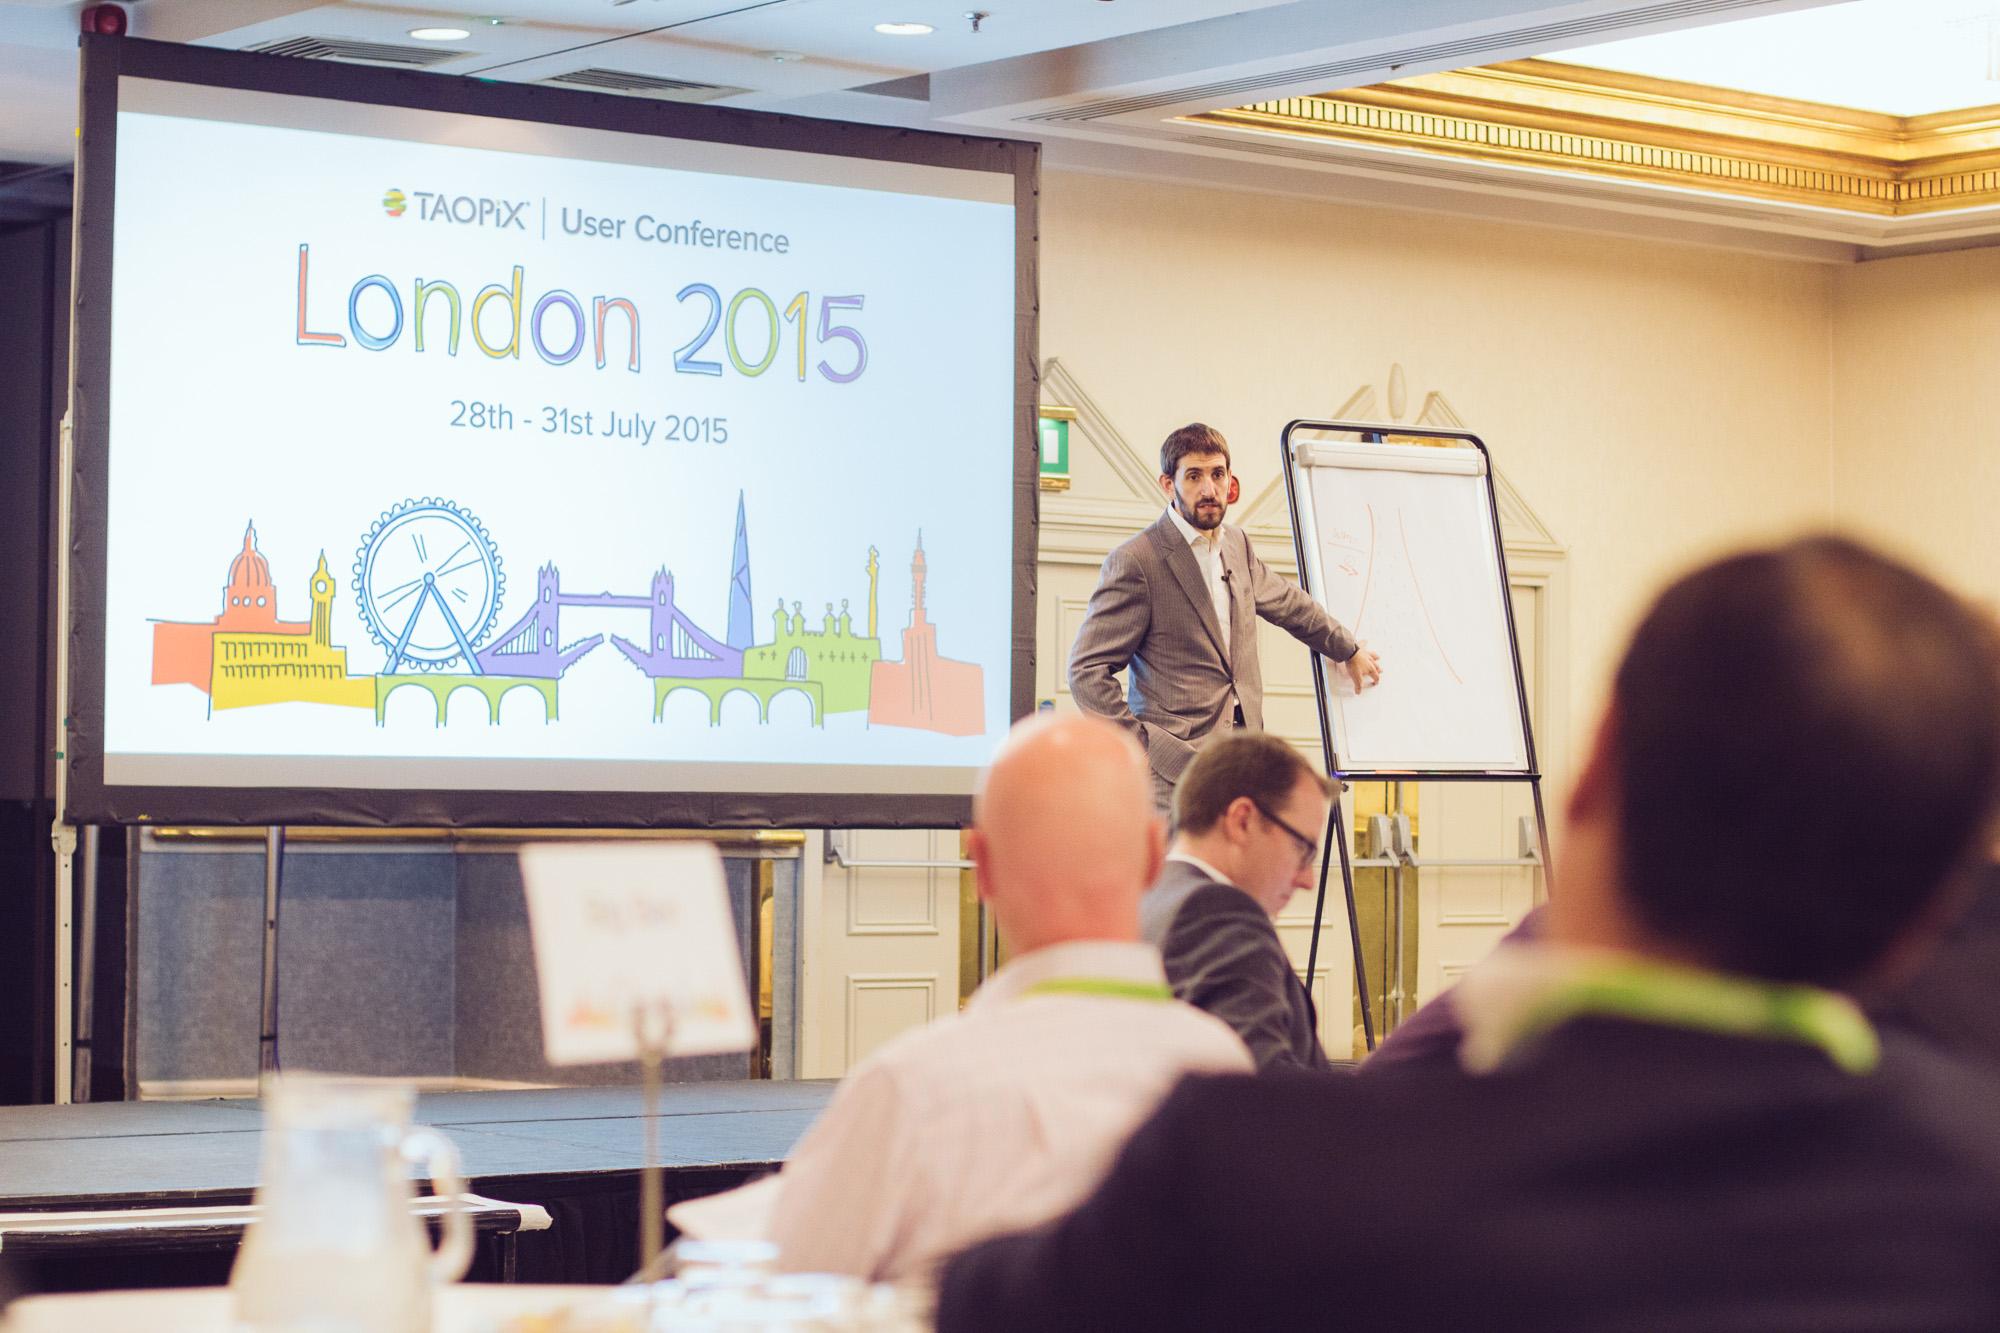 20150728-IMG_4739-London2015.jpg